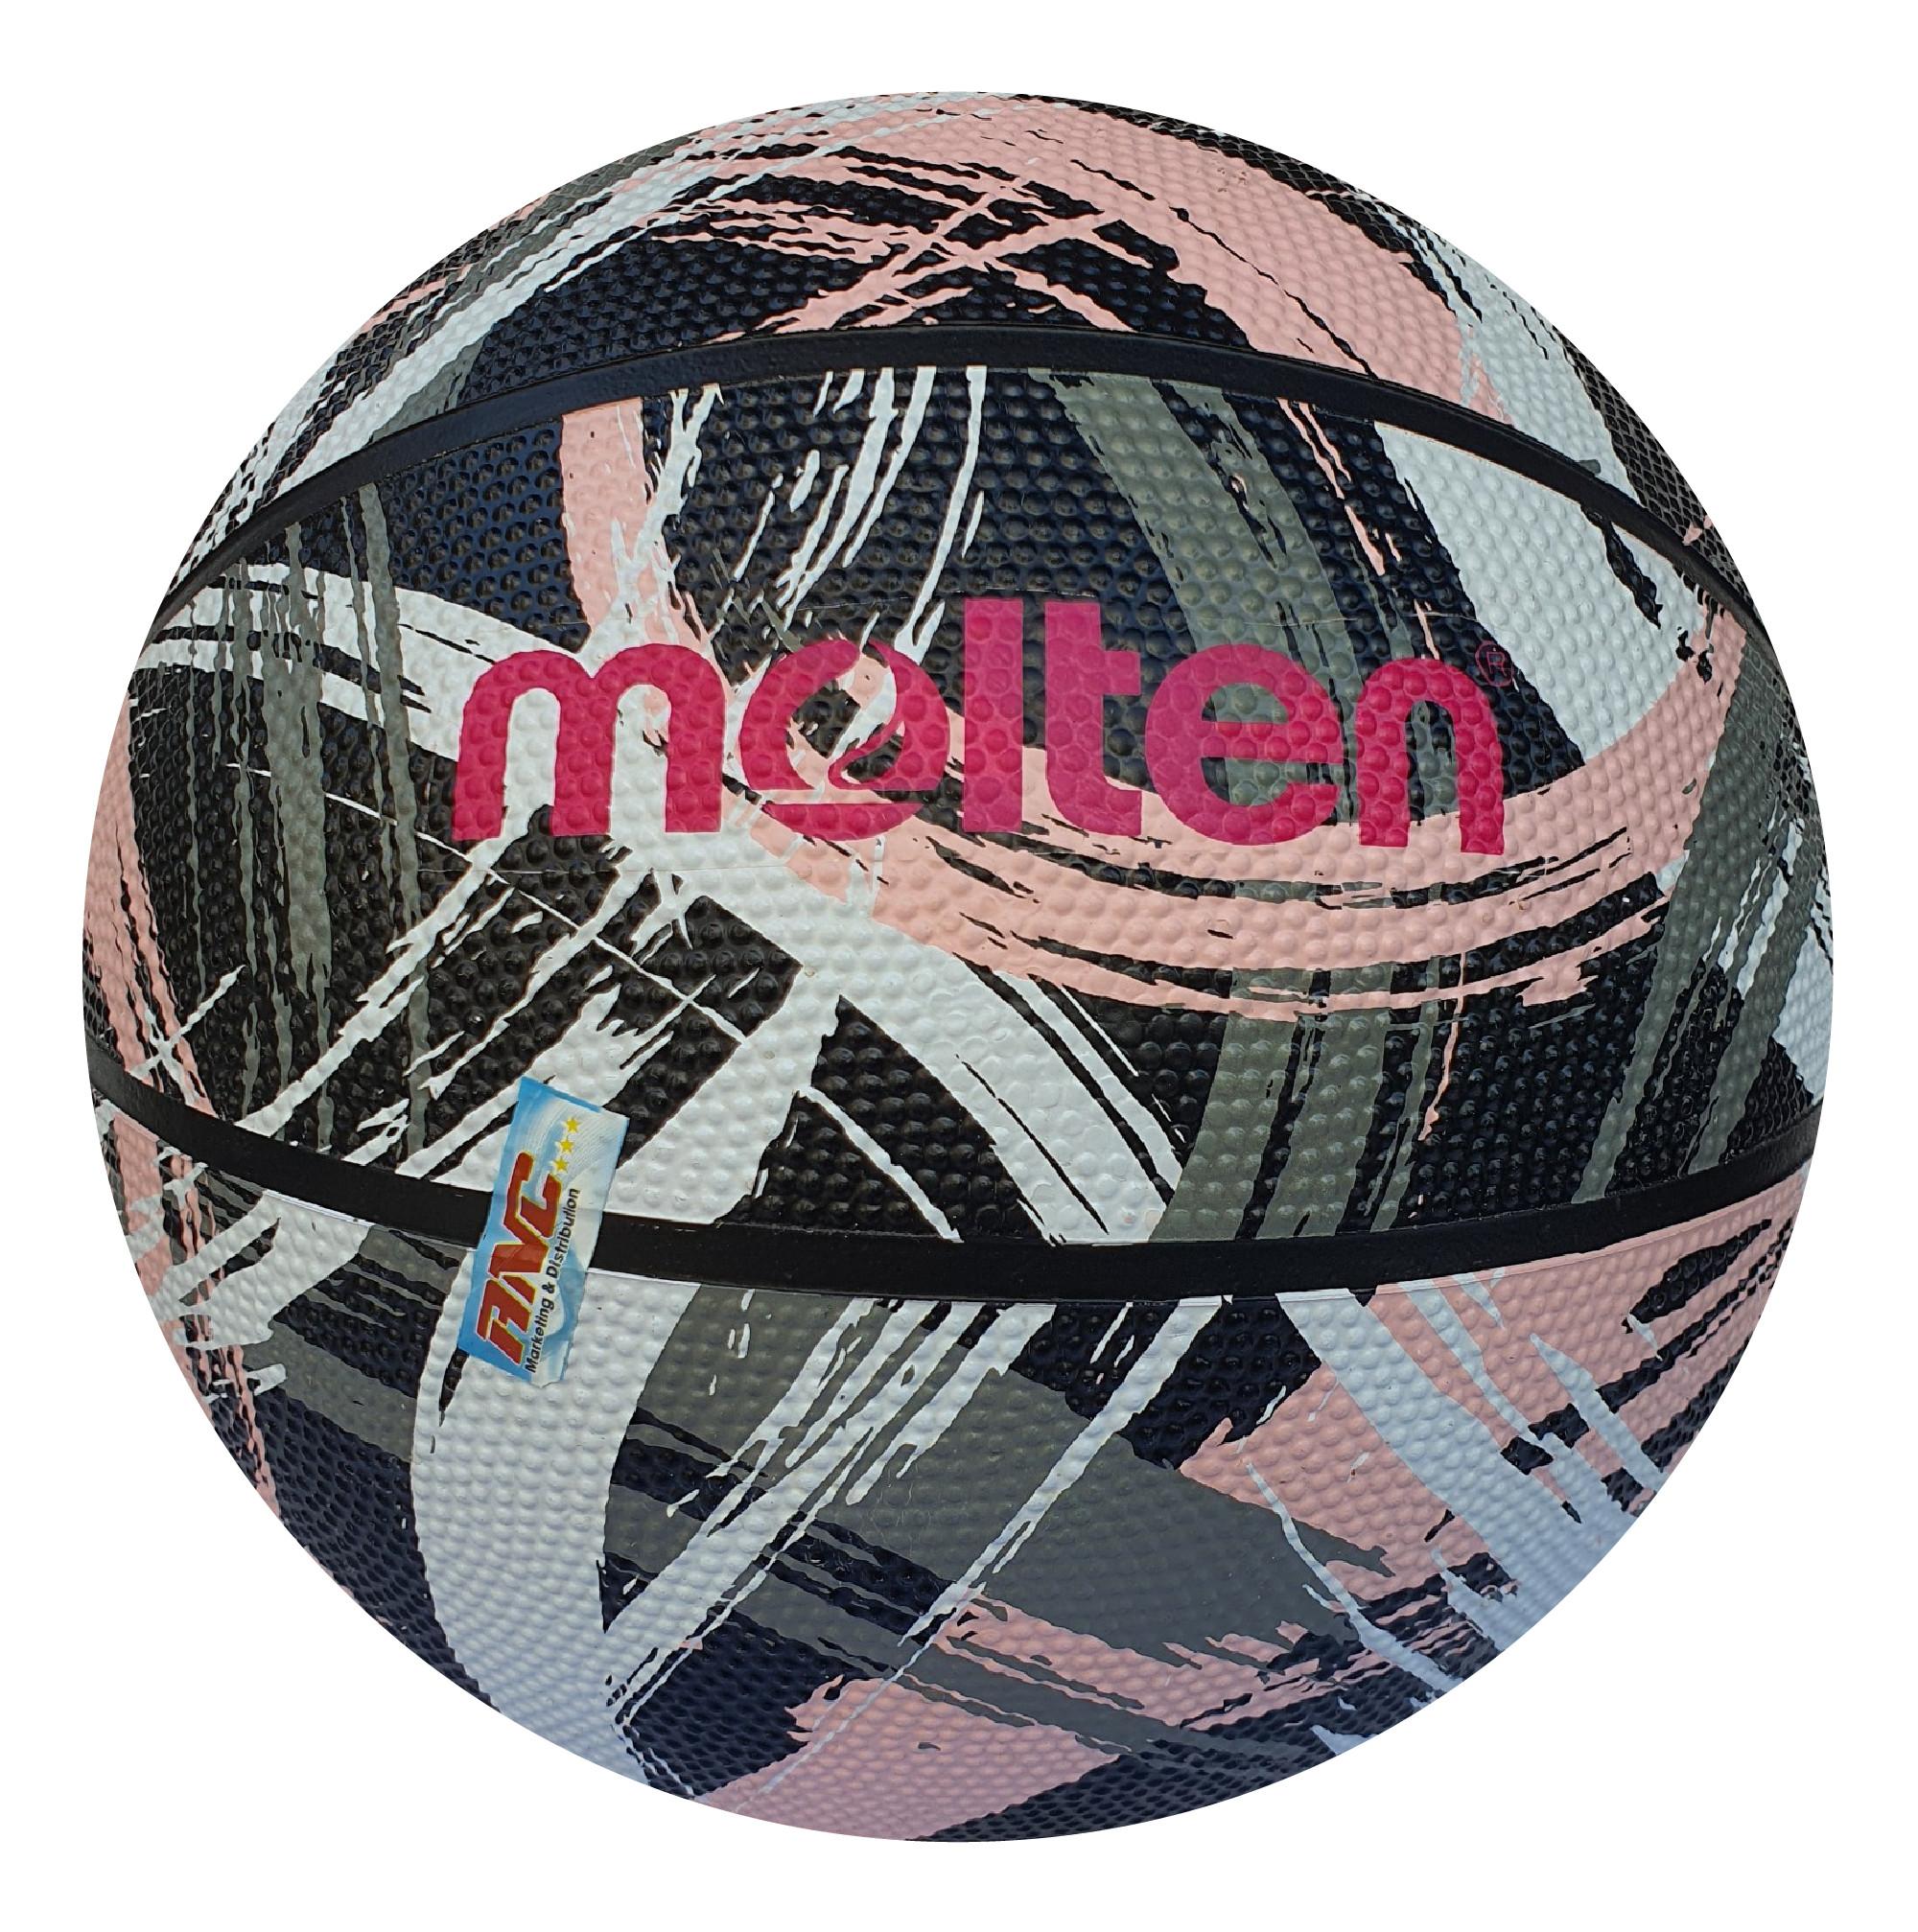 Bóng rổ Molten B7F1601 – KP Số 7